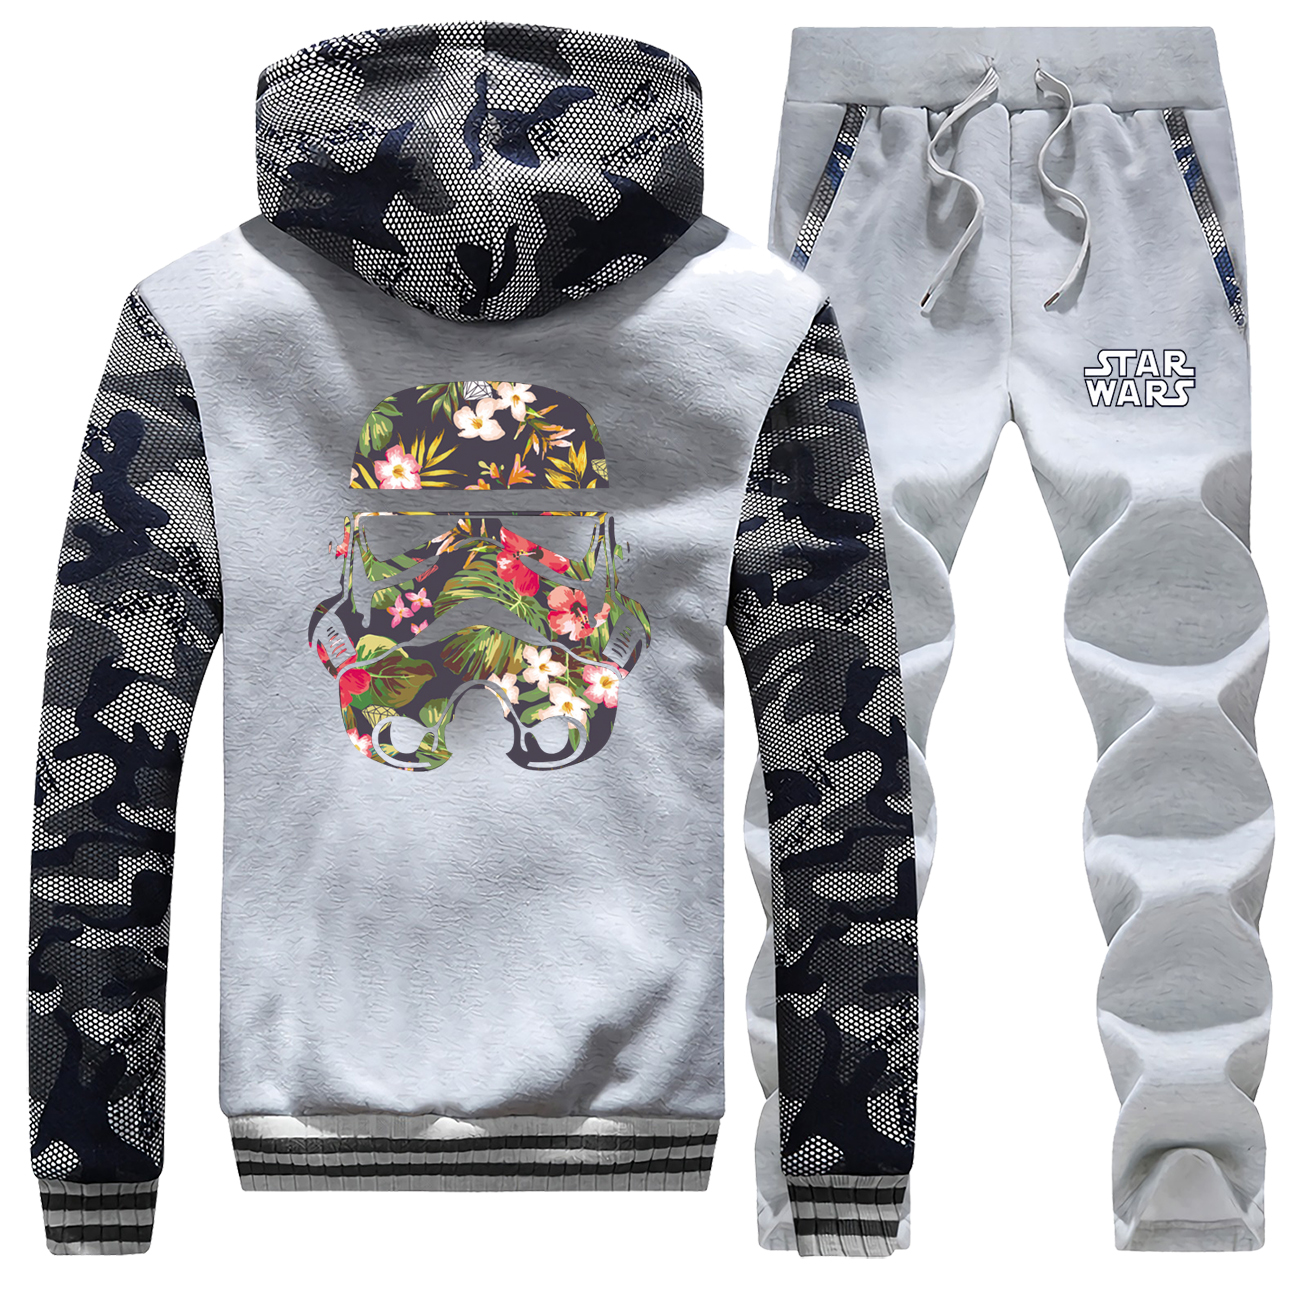 Star Wars Tracksuits Jacket Pant Set Men Selfie Stormtrooper Sportsuits Sweatshirts Hoodie Sweatpant Suit 2 PCS Camo Sportswear